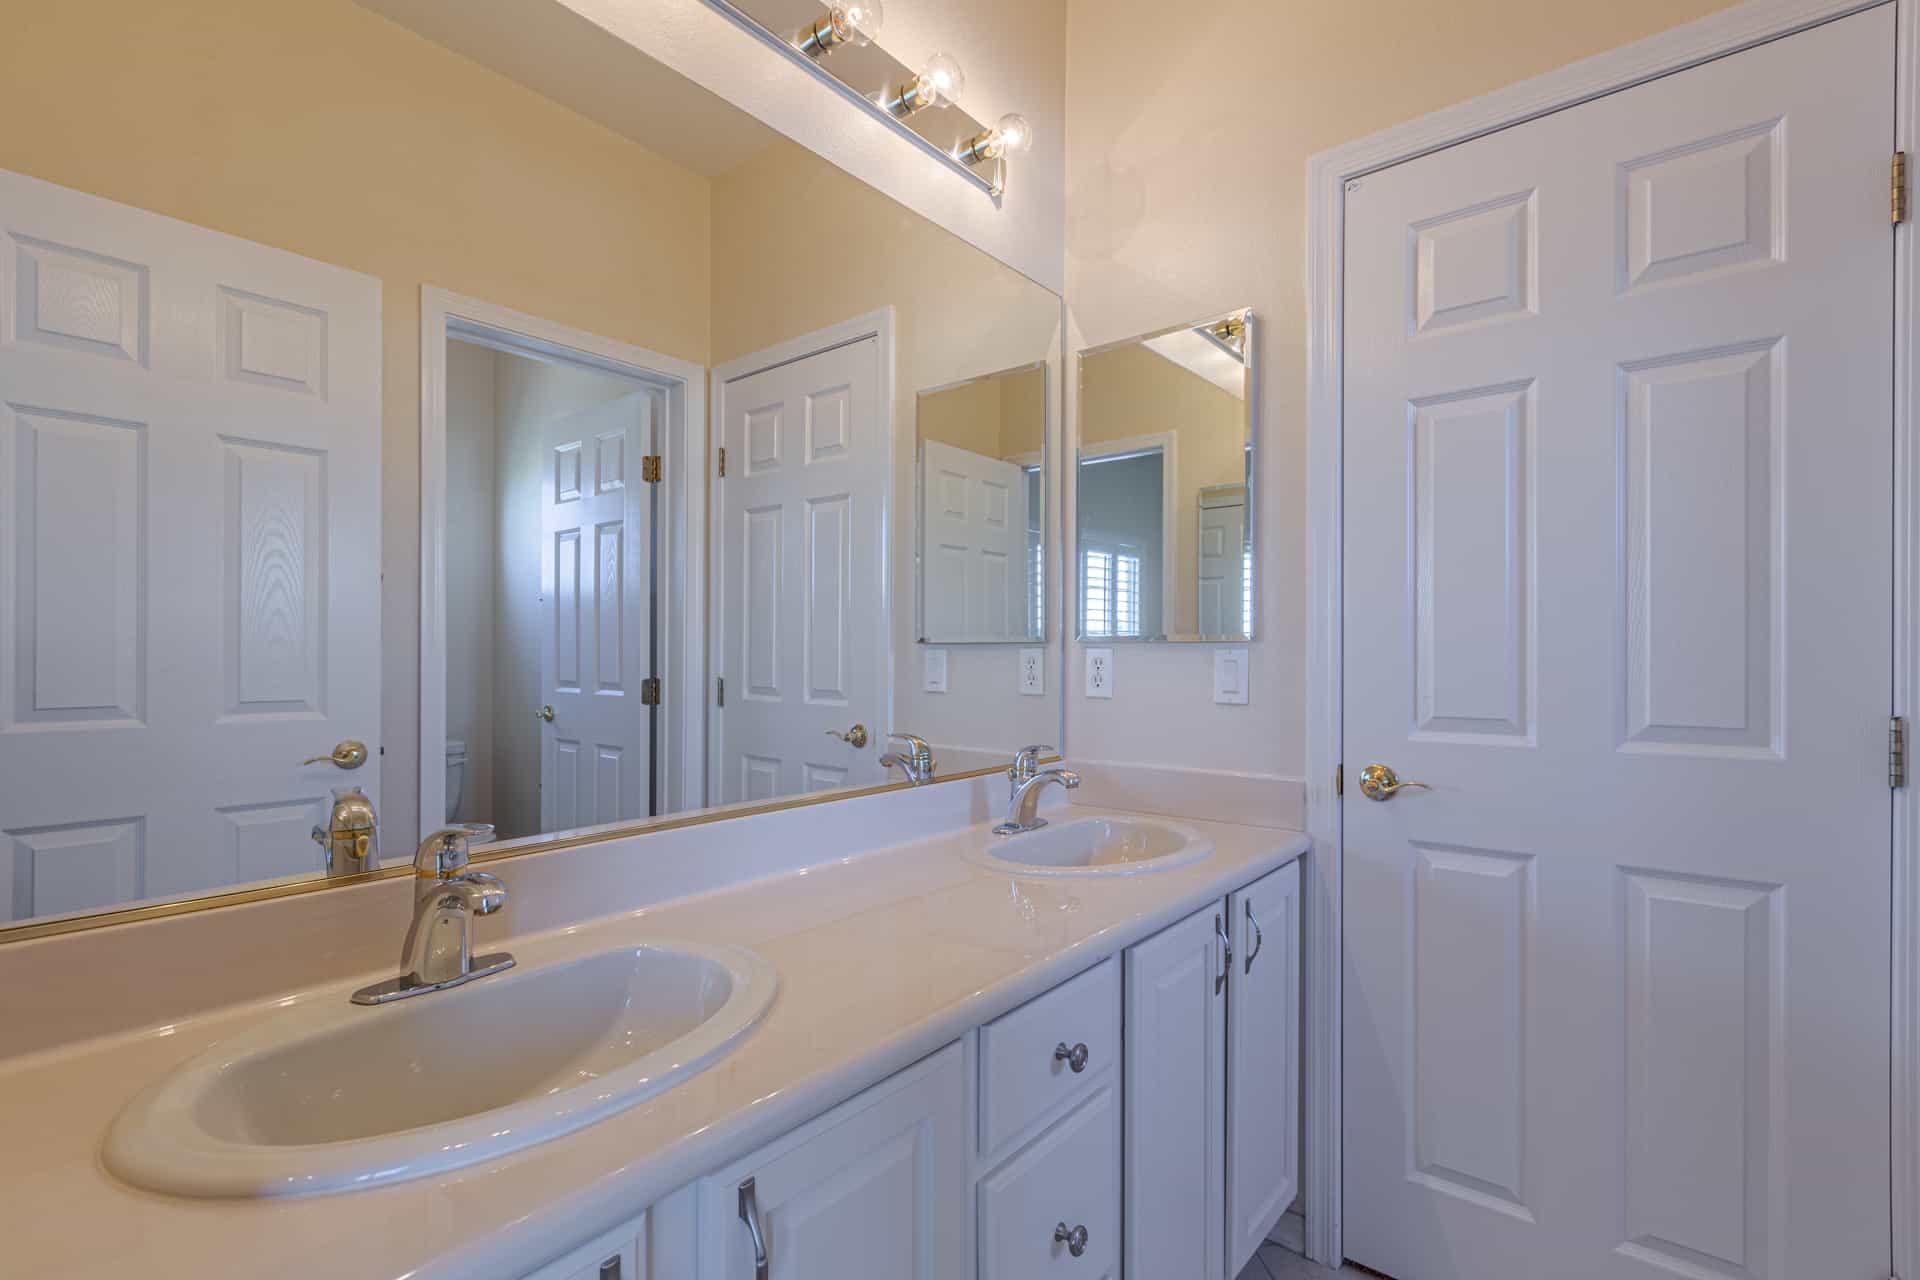 las-vegas-luxry-real-estate-realtor-rob-jensen-company-10729-grey-havens-court-willow-creek4457